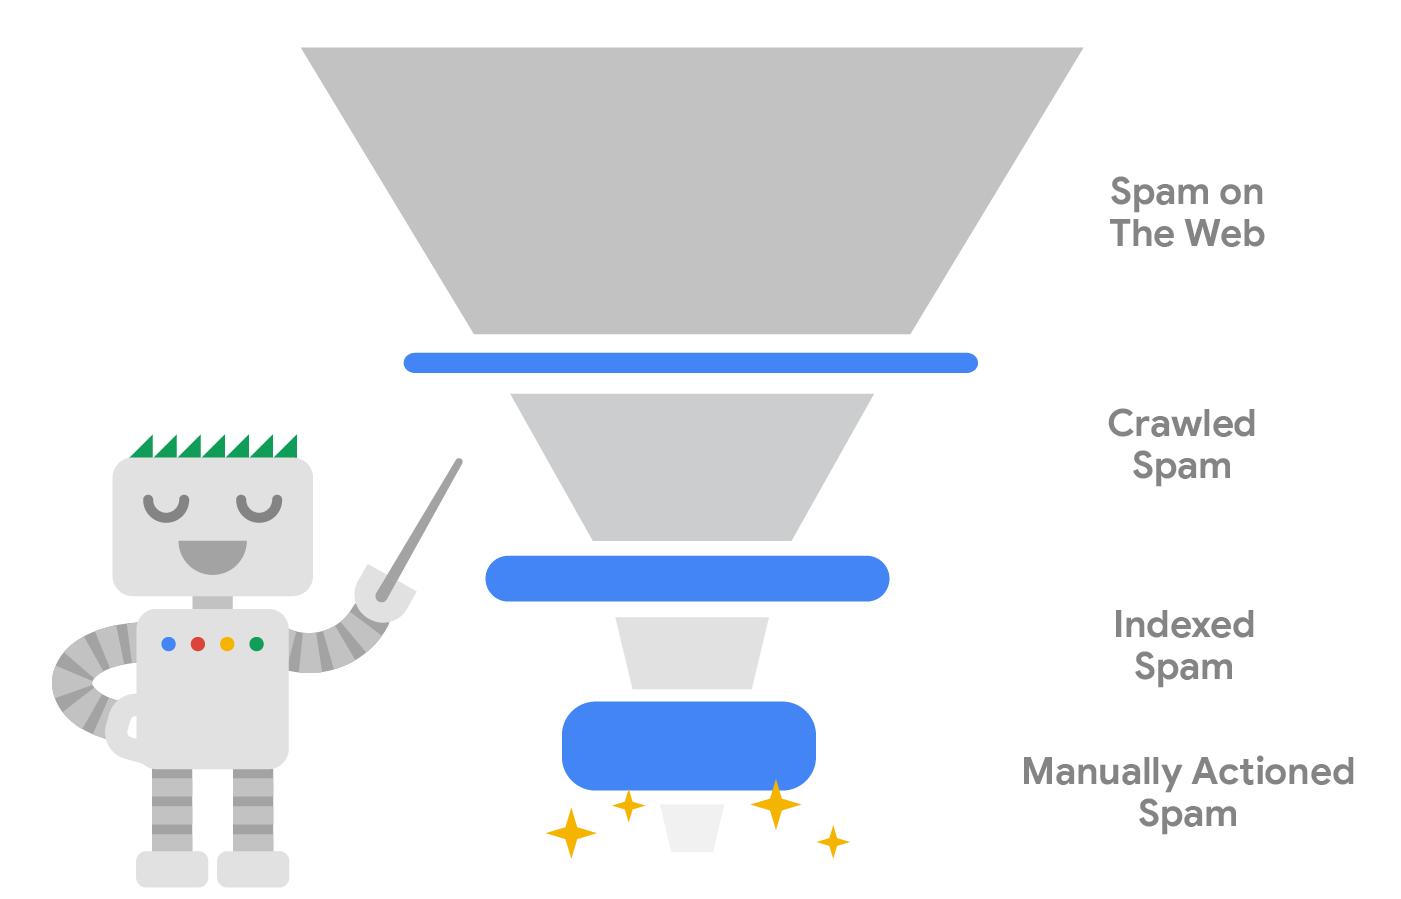 Google 如何在每個步驟防範垃圾內容